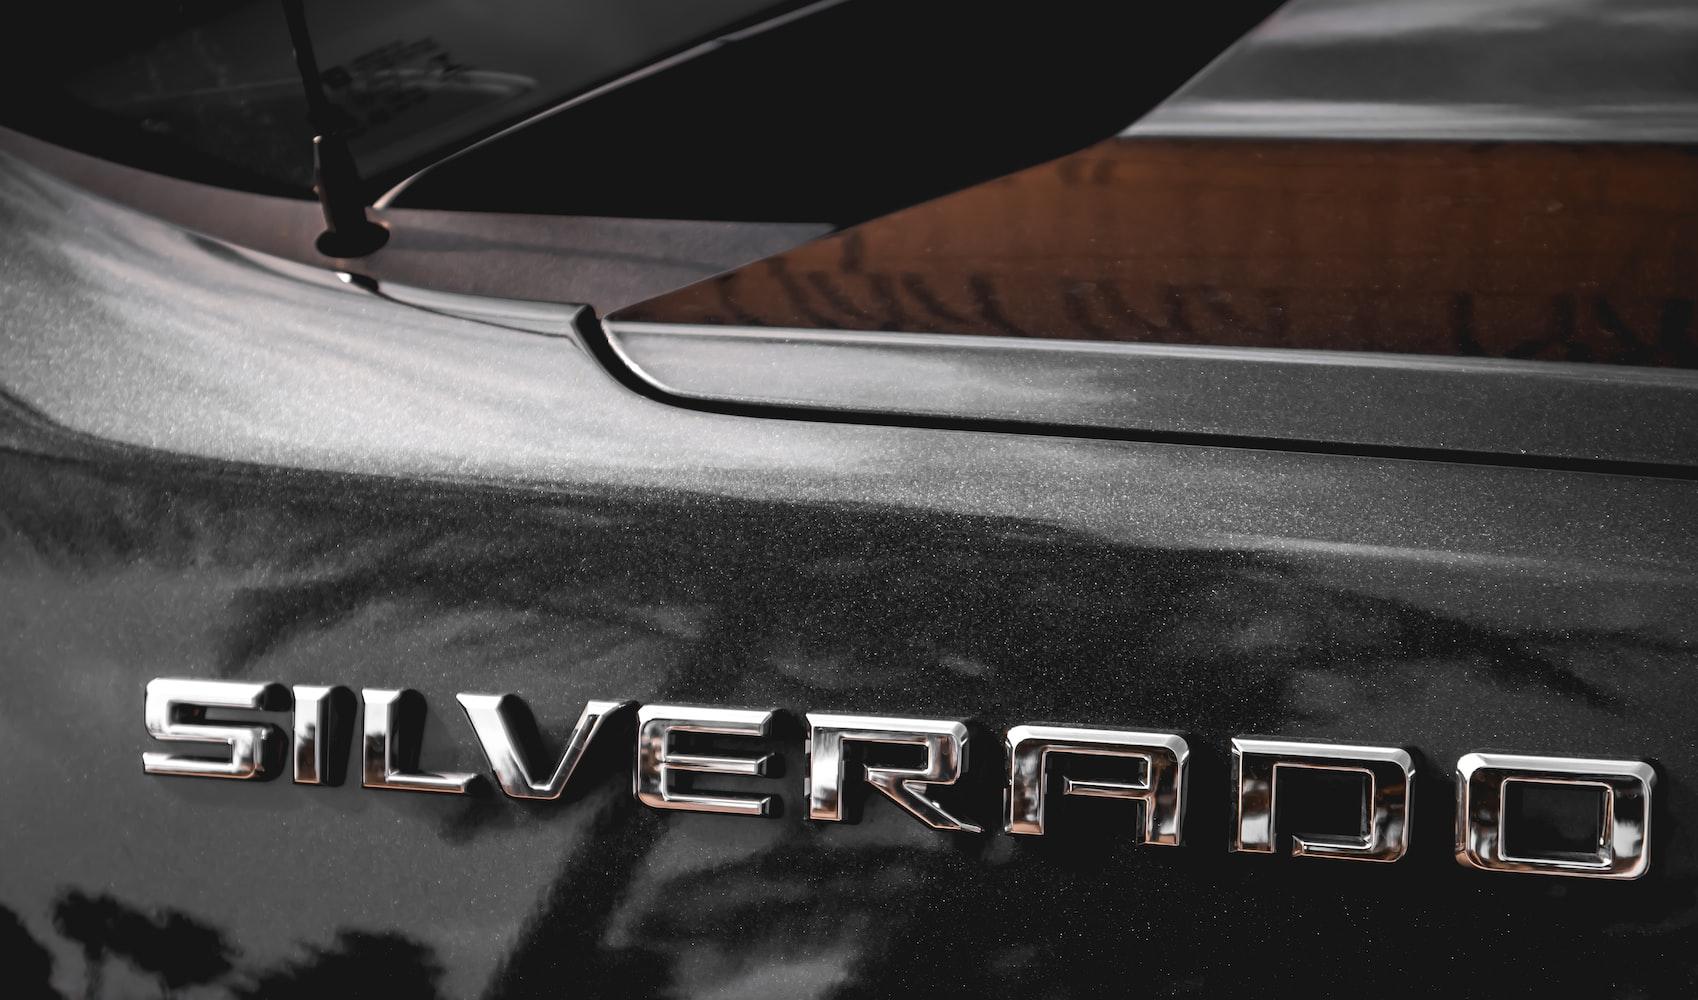 Back bumper of a Chevy Silverado